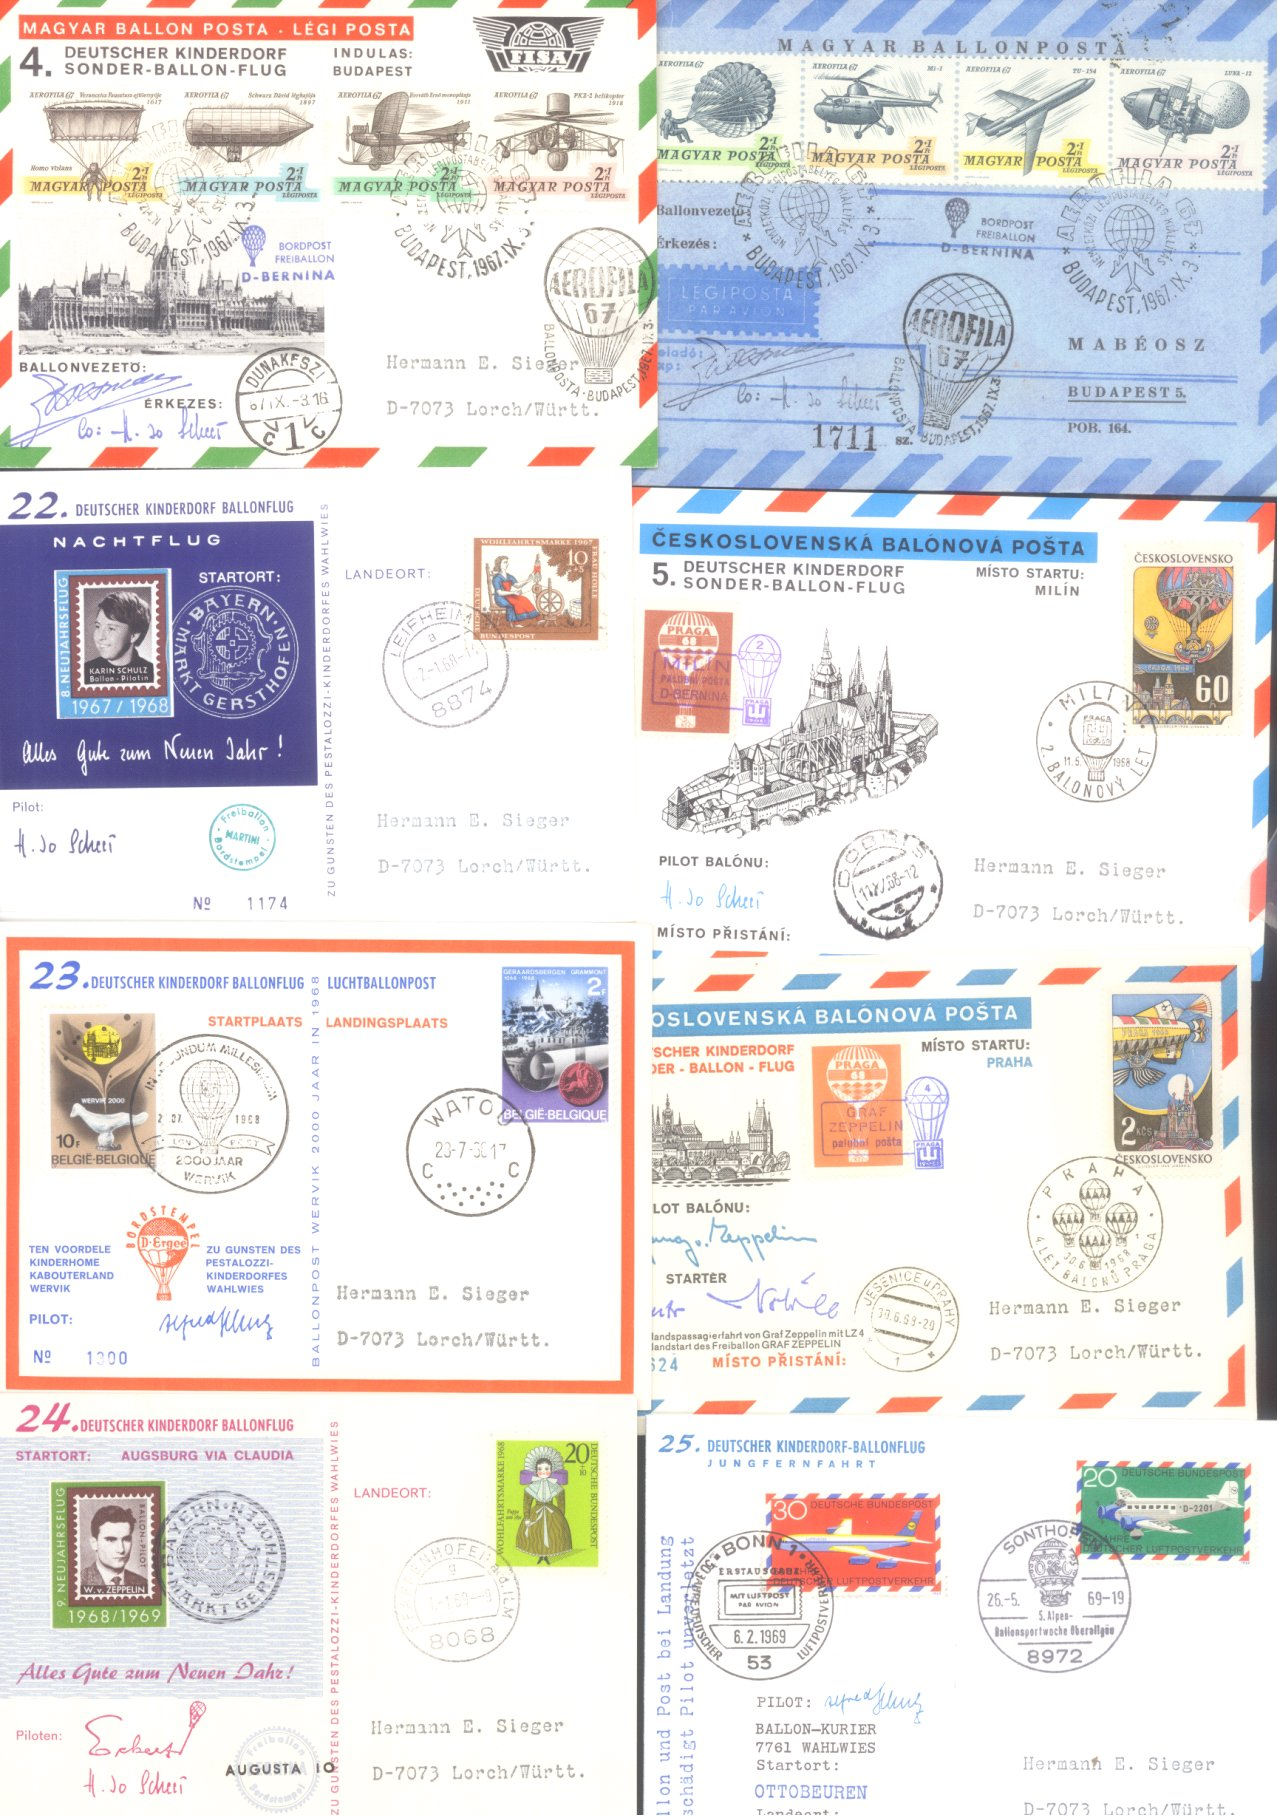 MOTIV BALLONPOST / KINDERDORF BALLONPOST 1952-1972-4